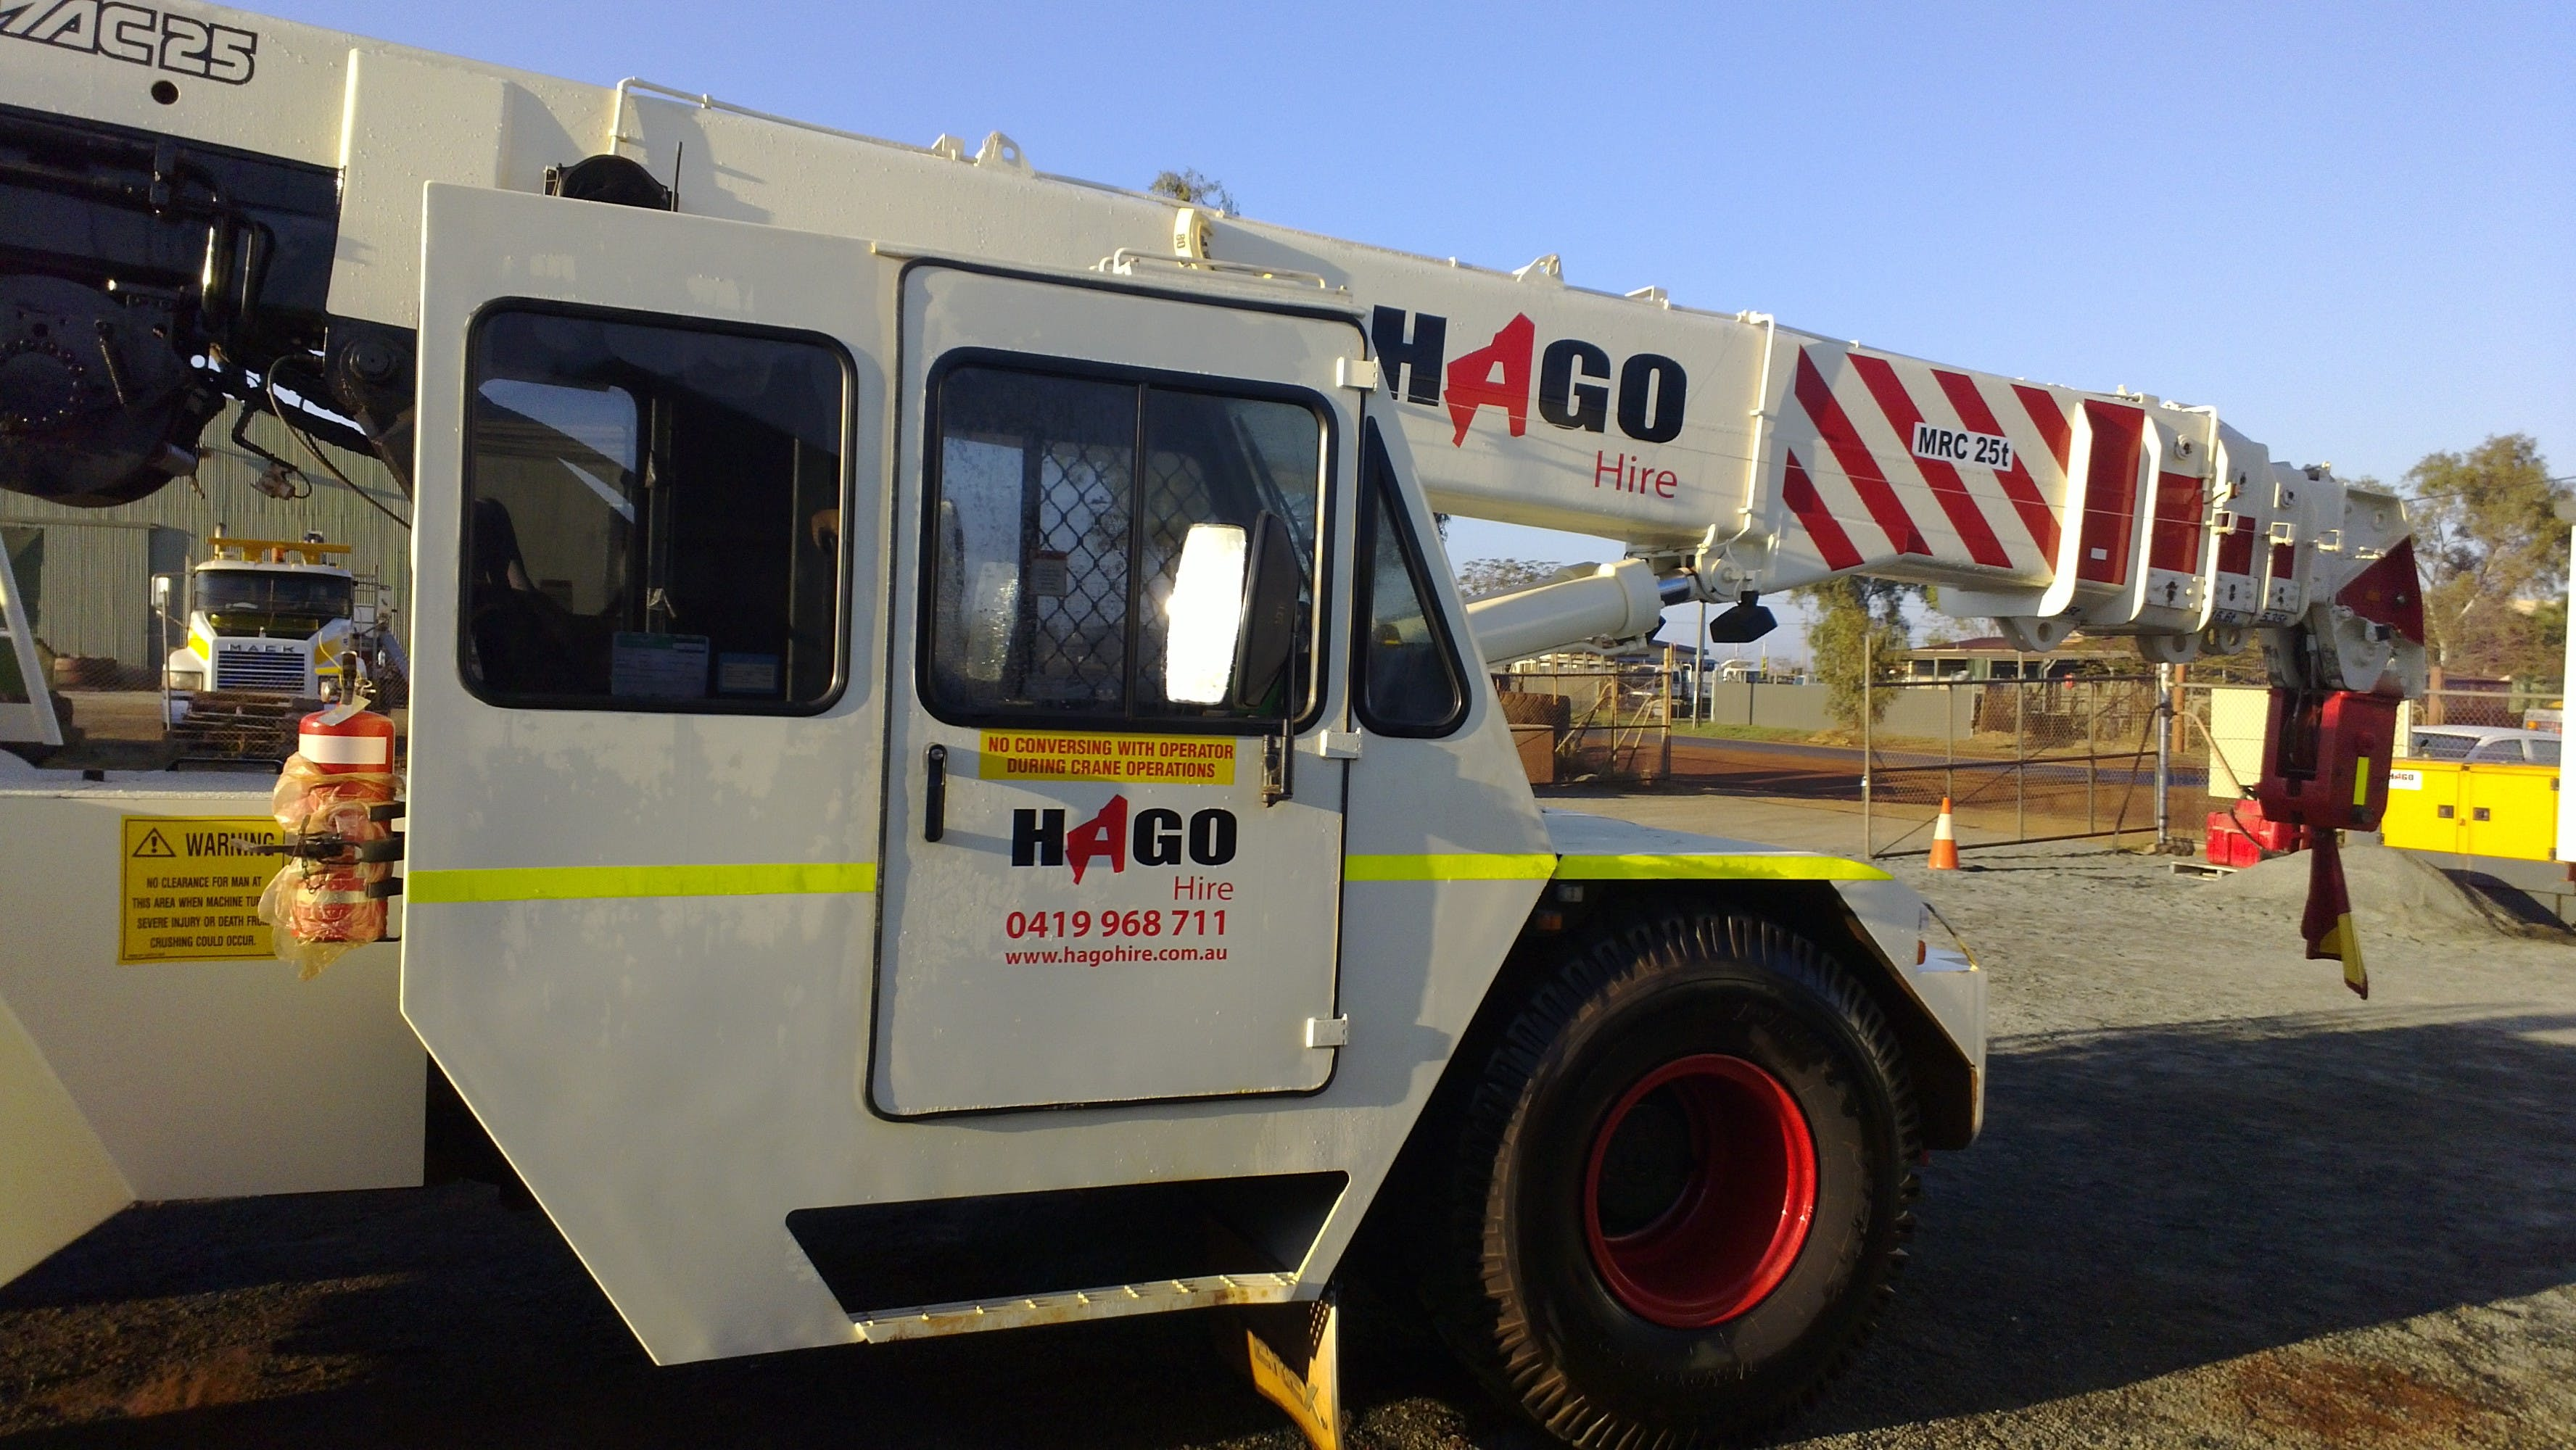 Hago Crane & Machinery Hire